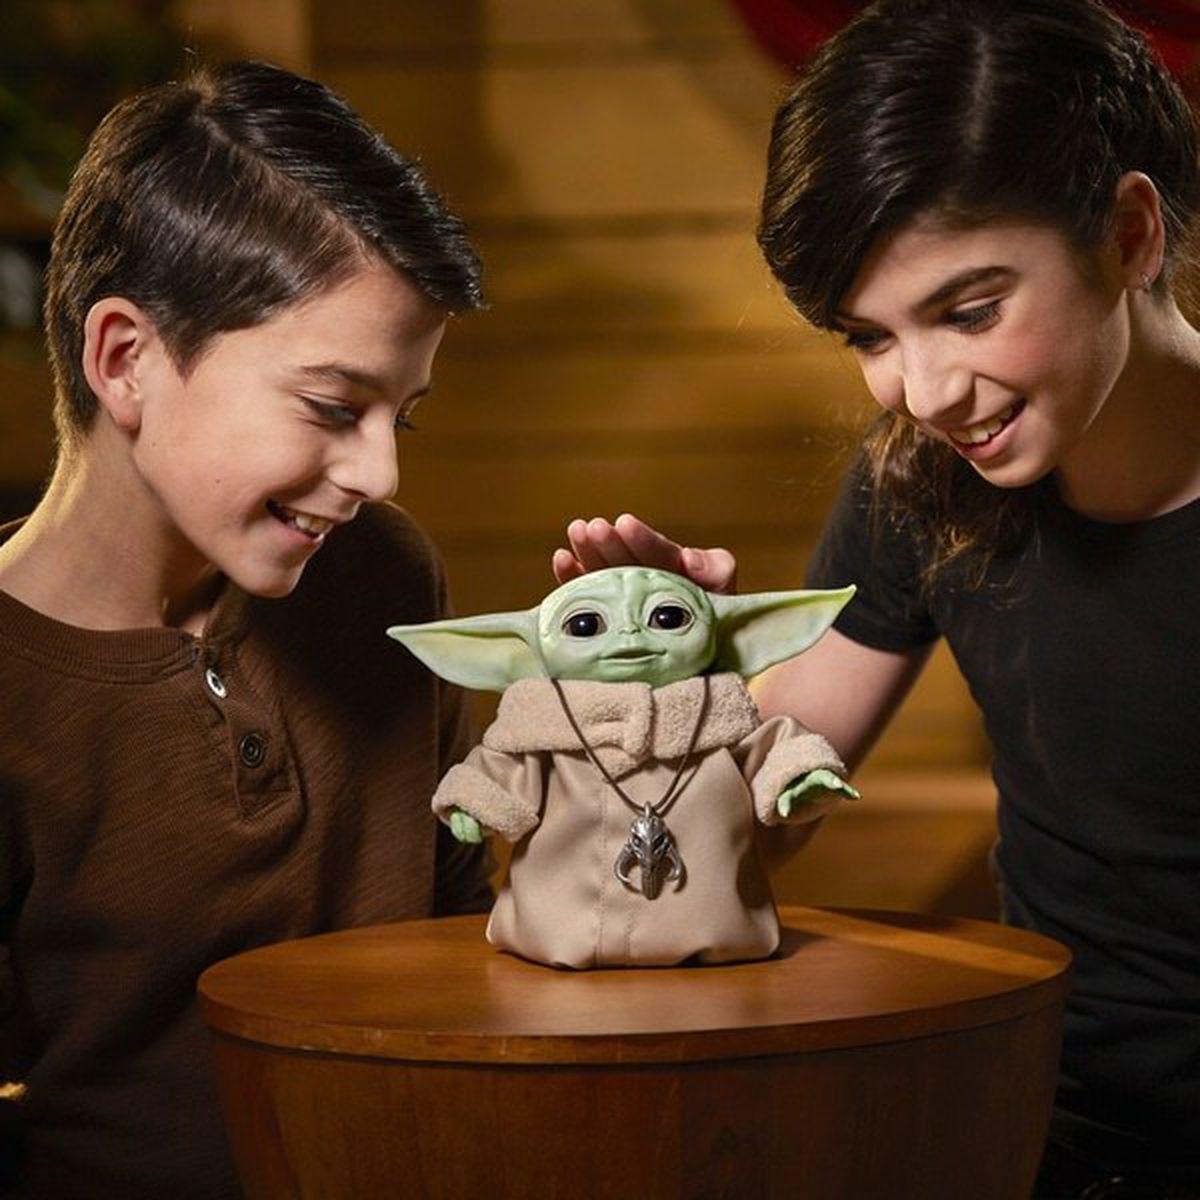 Star Wars Mandalorian The Child Animatronic